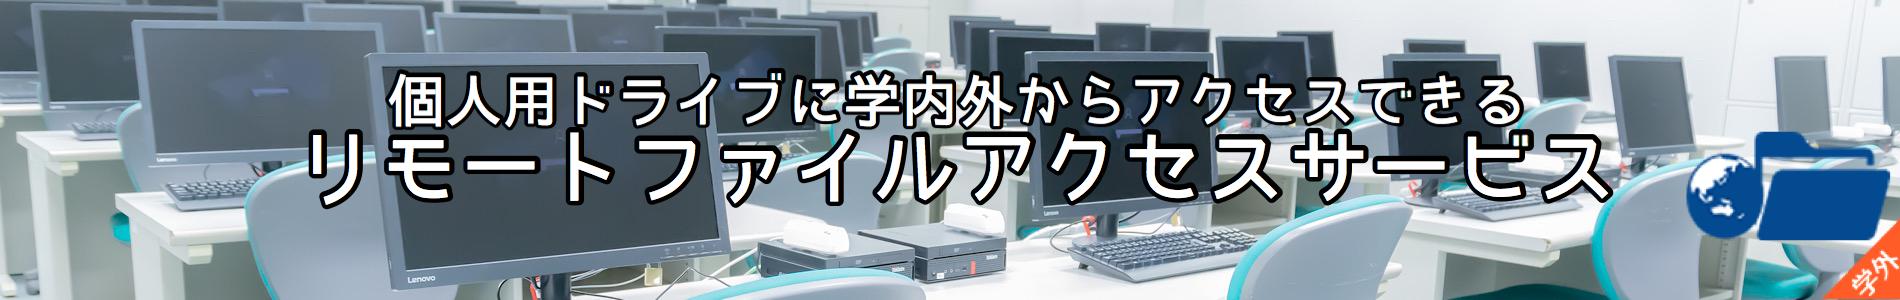 https://web.ipc.tohoku-gakuin.ac.jp/service/service_list/remotefileaccess/